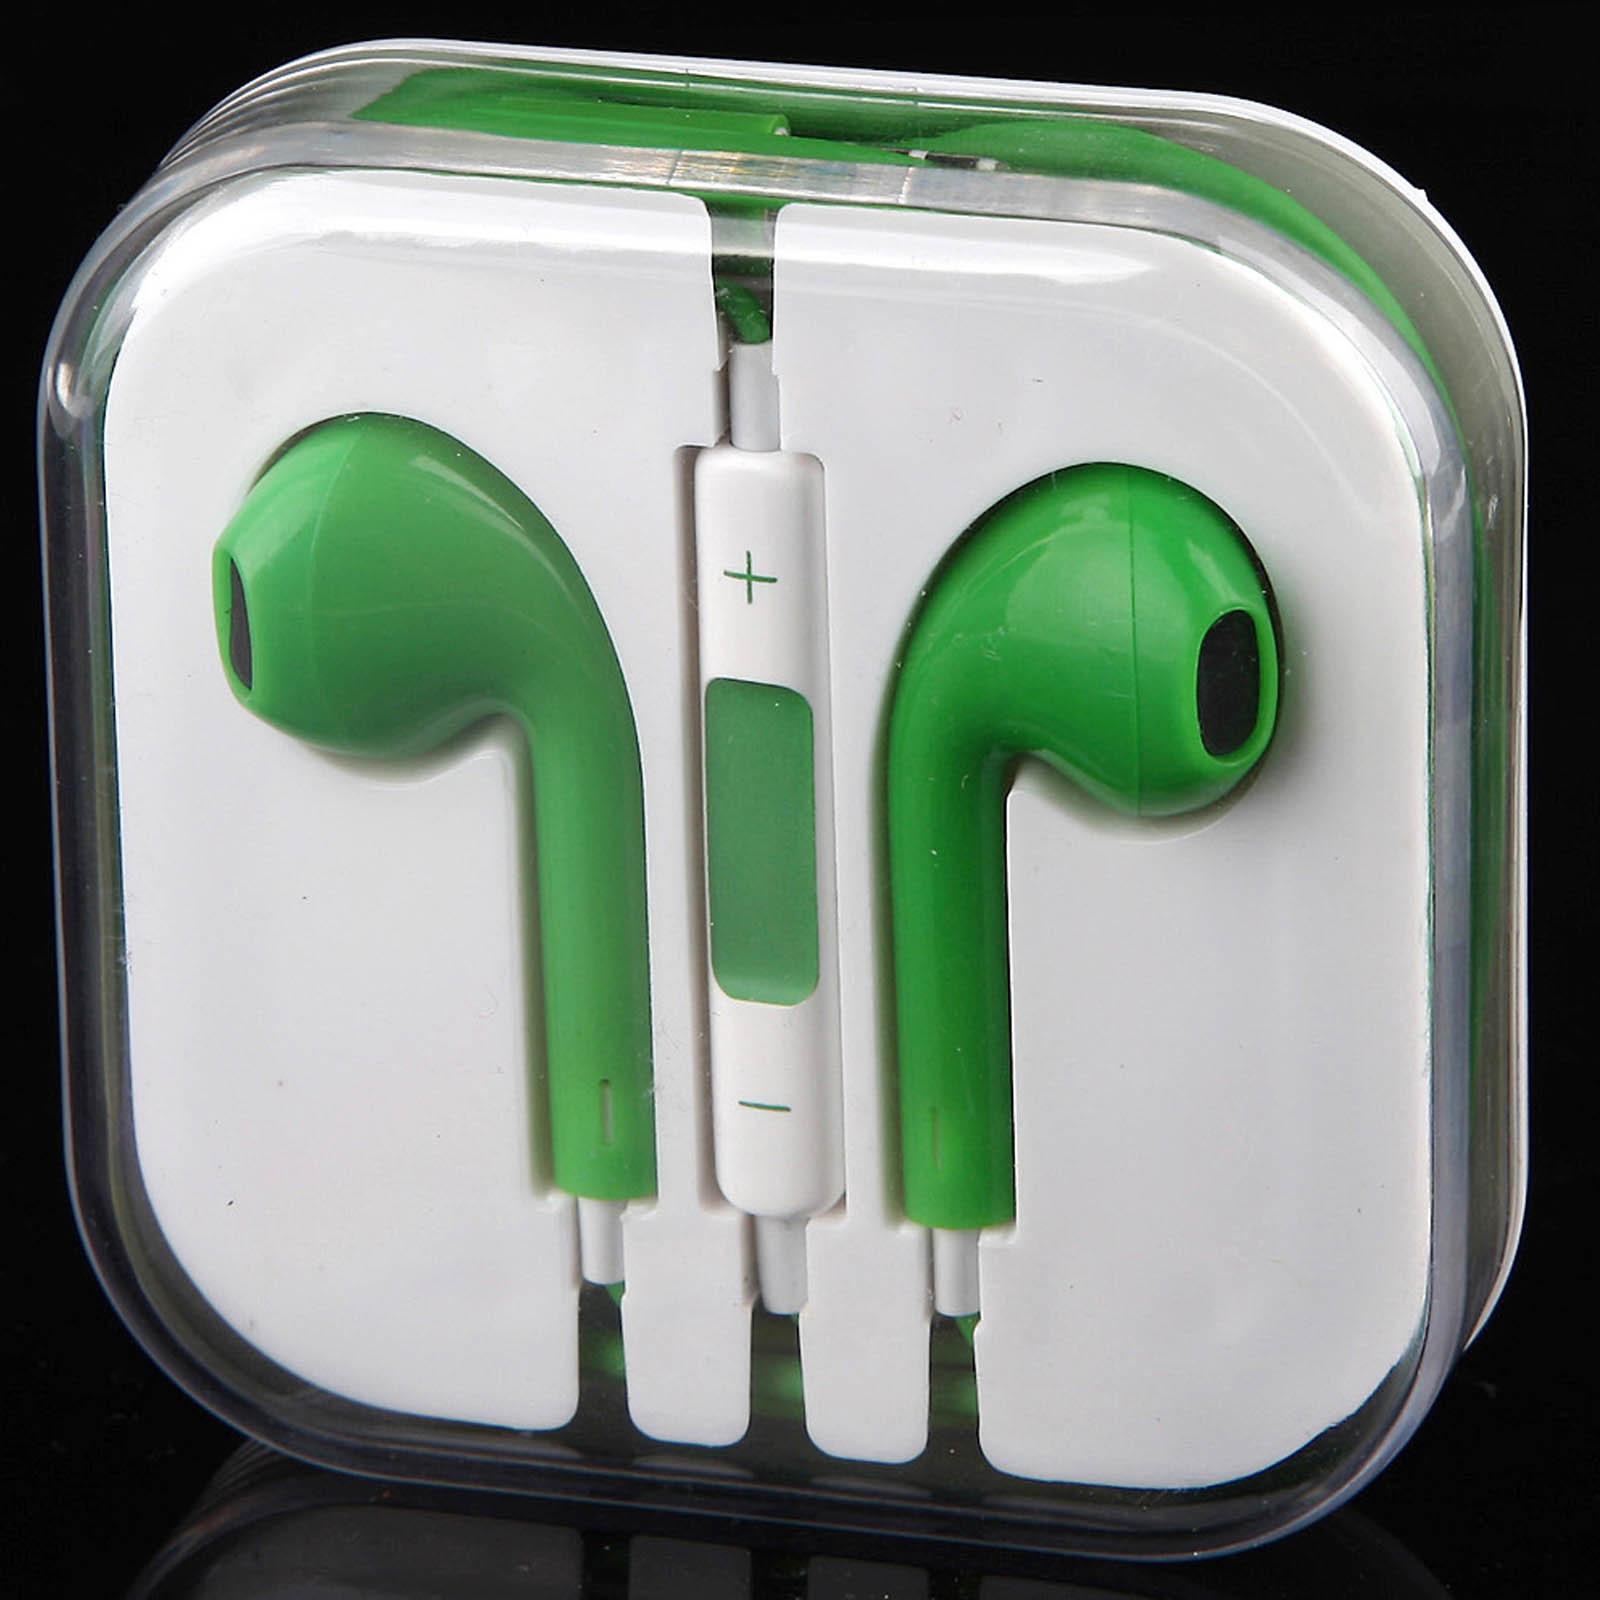 earphone-for-iphone-green.jpg